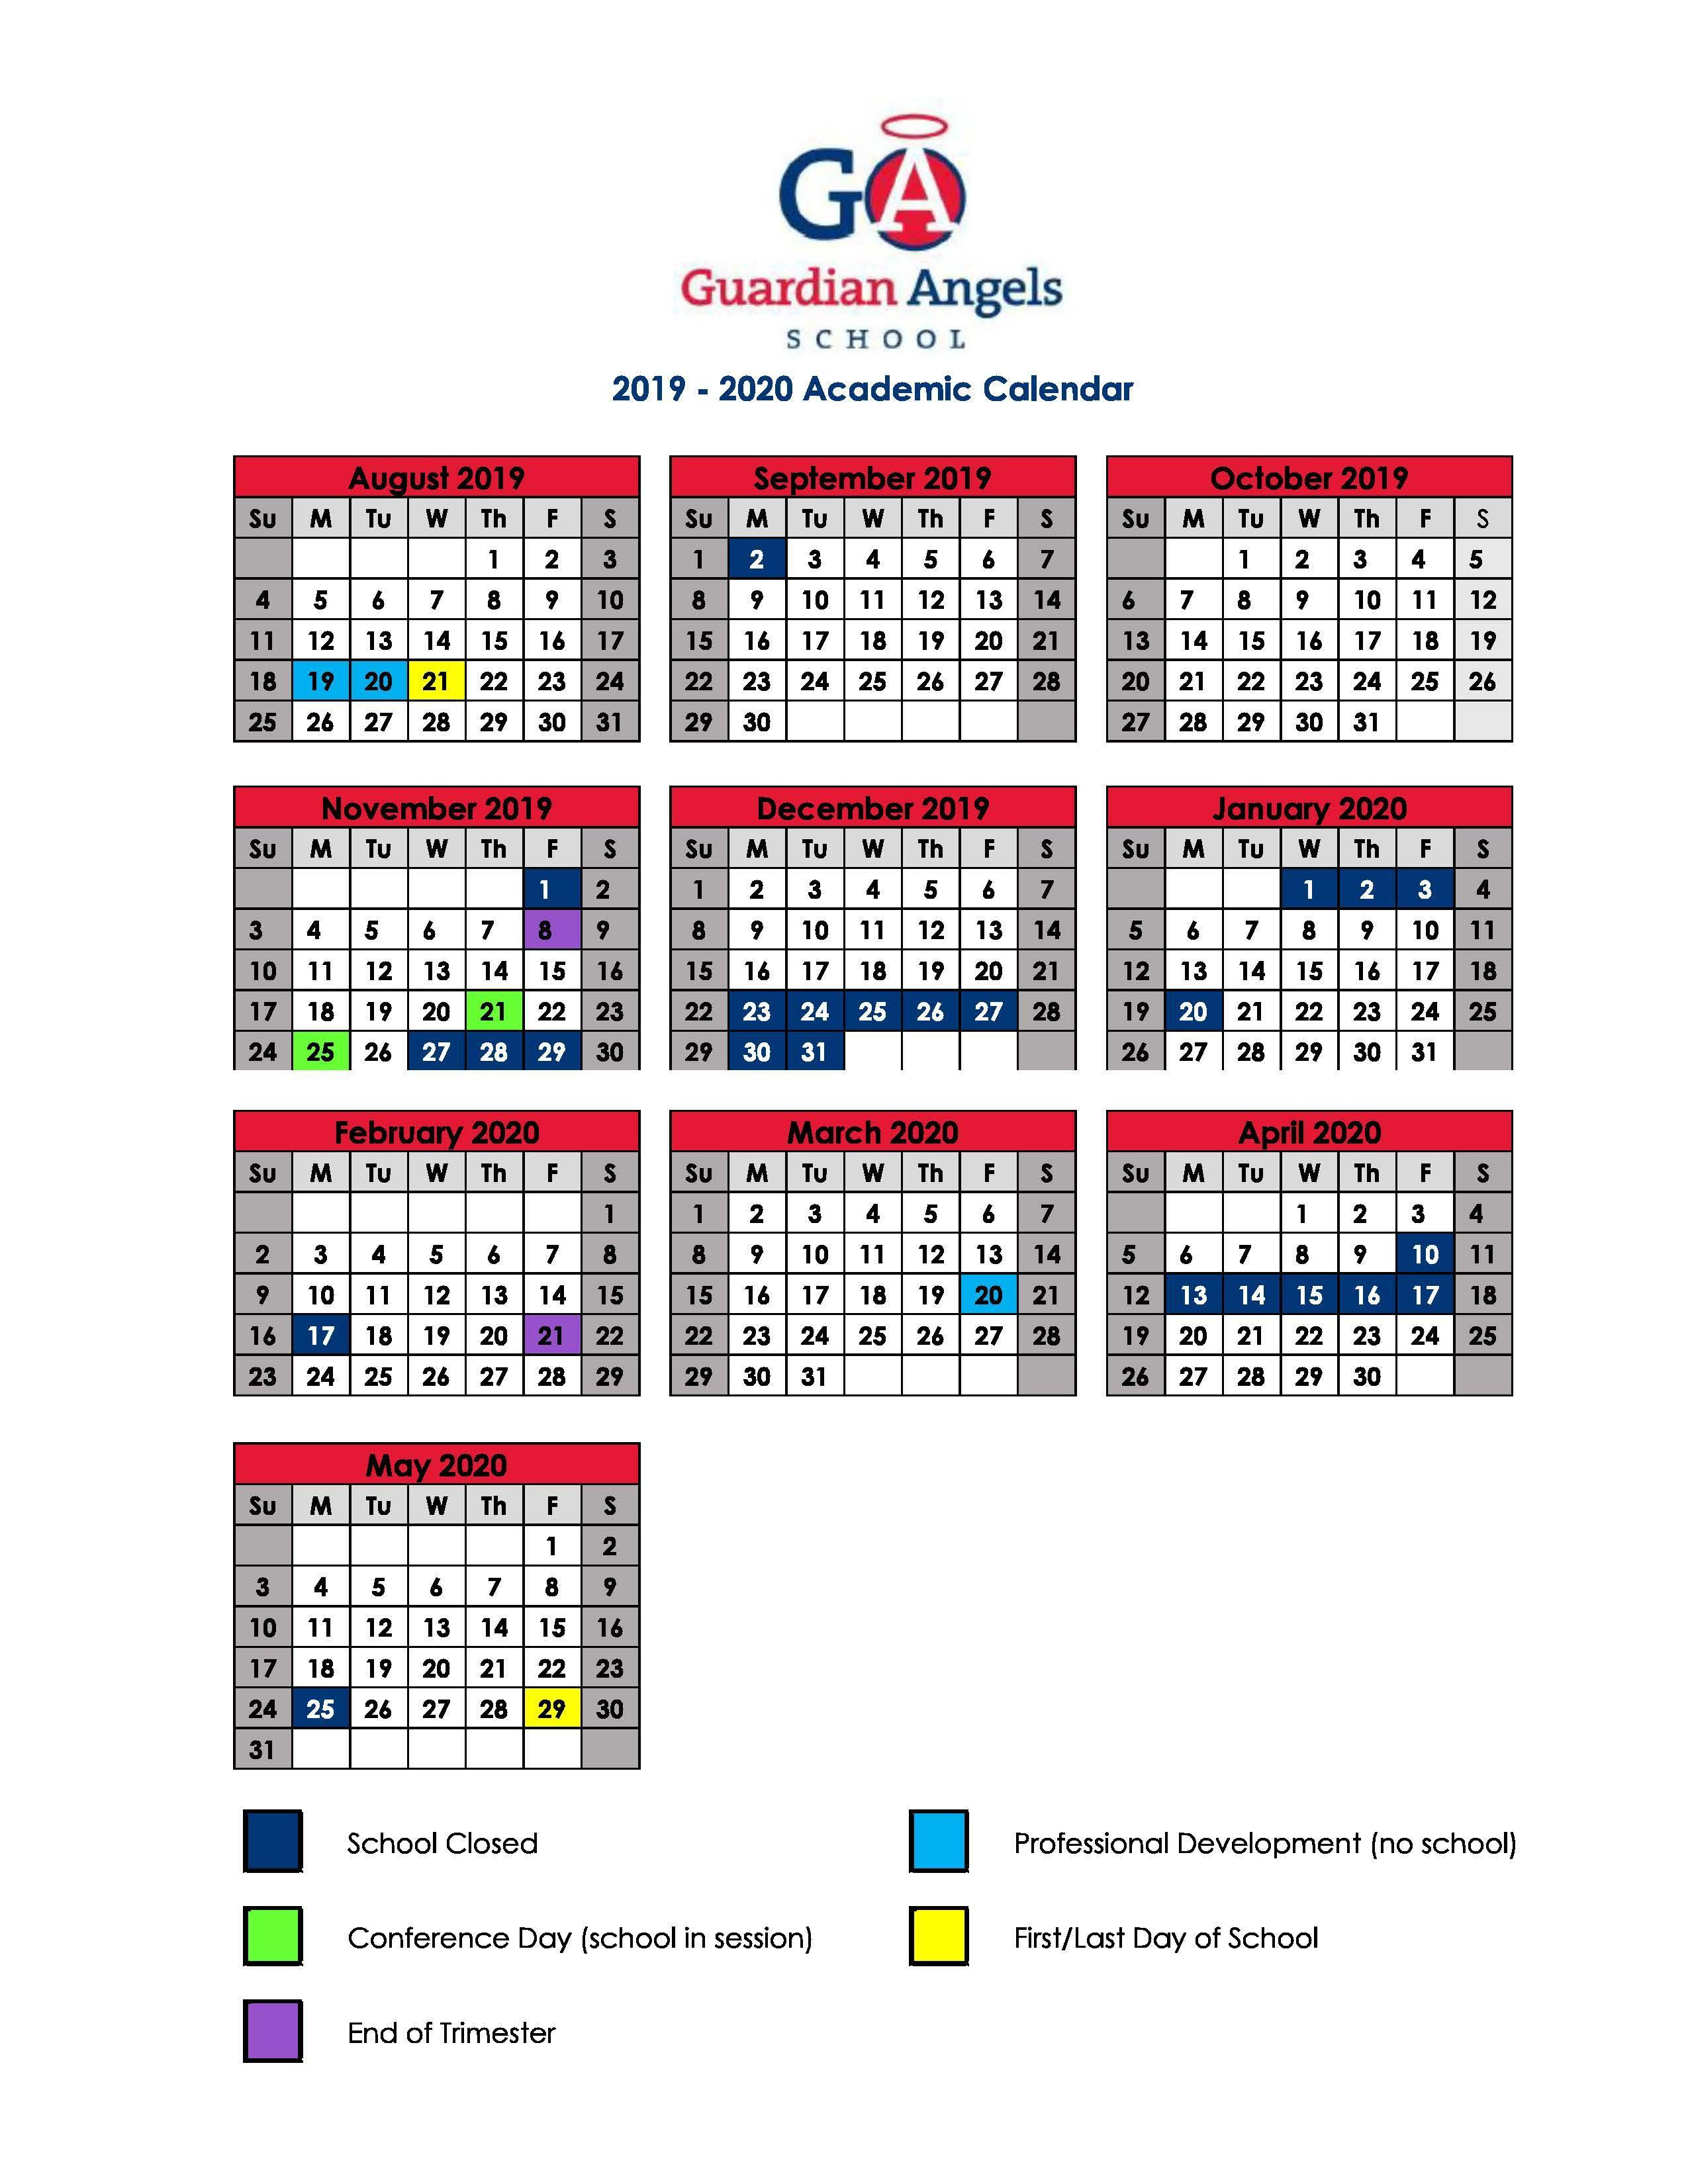 School Calendar – Parents – Guardian Angels School